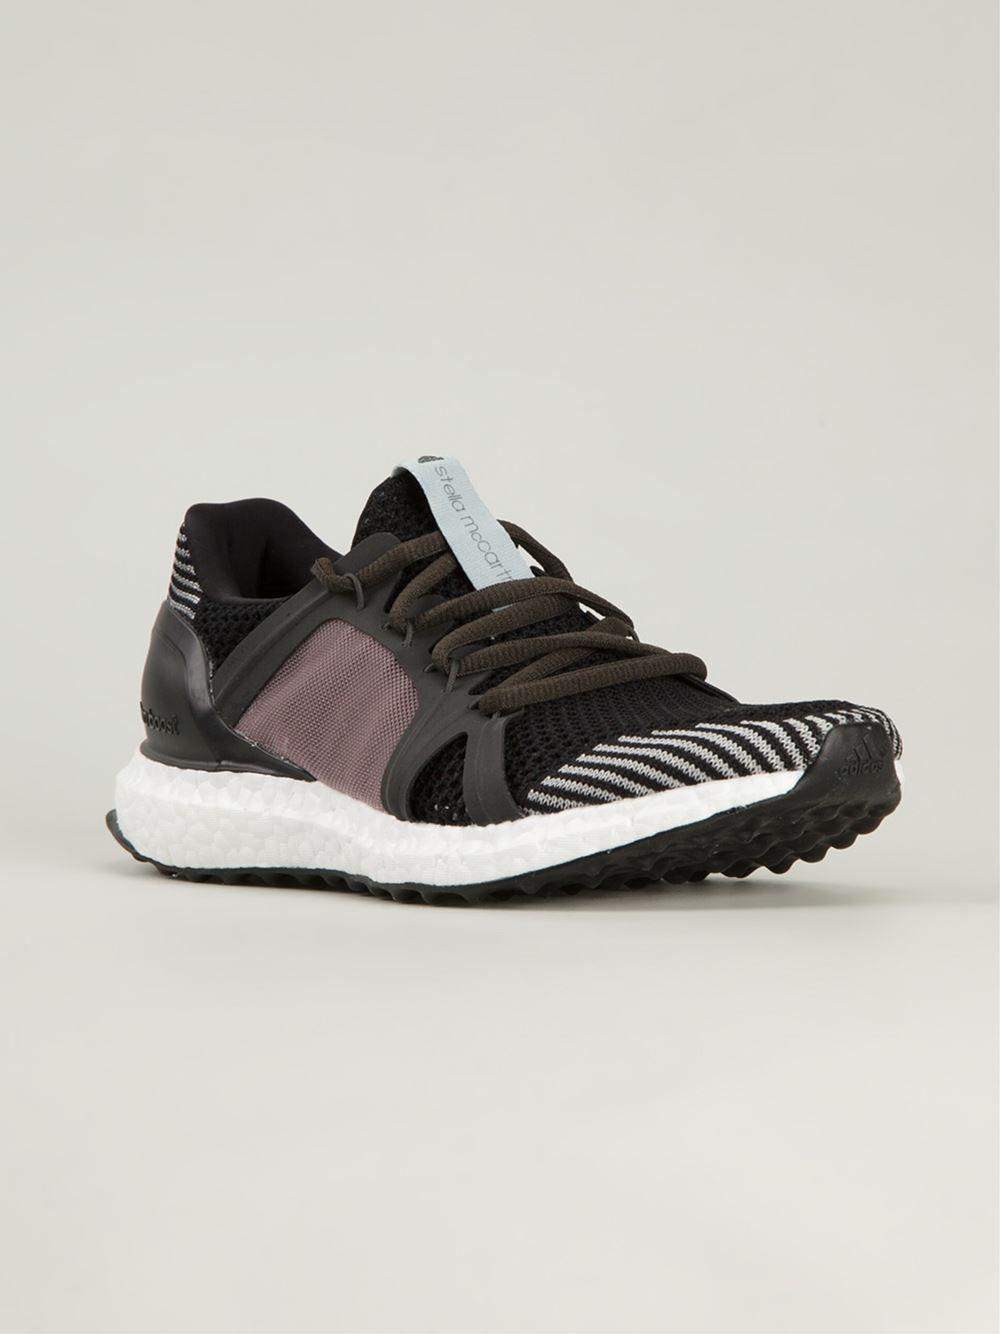 sale retailer 934fa c10d6 Adidas By Stella Mccartney  ultra Boost  Sneakers - Tiziana Fausti -  Farfetch.com